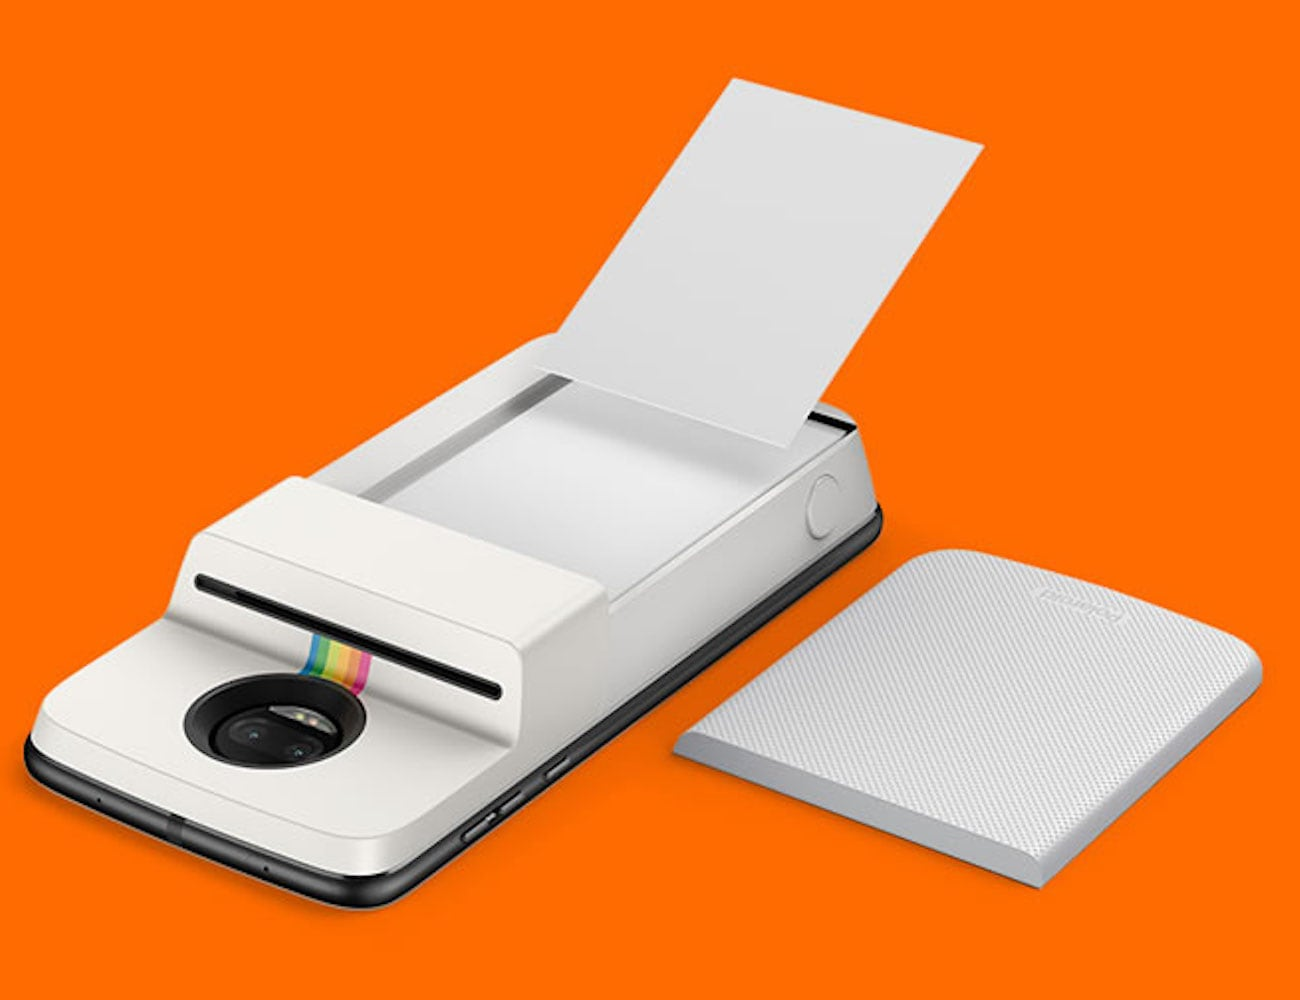 Moto Mods Polaroid Insta-Share Printer